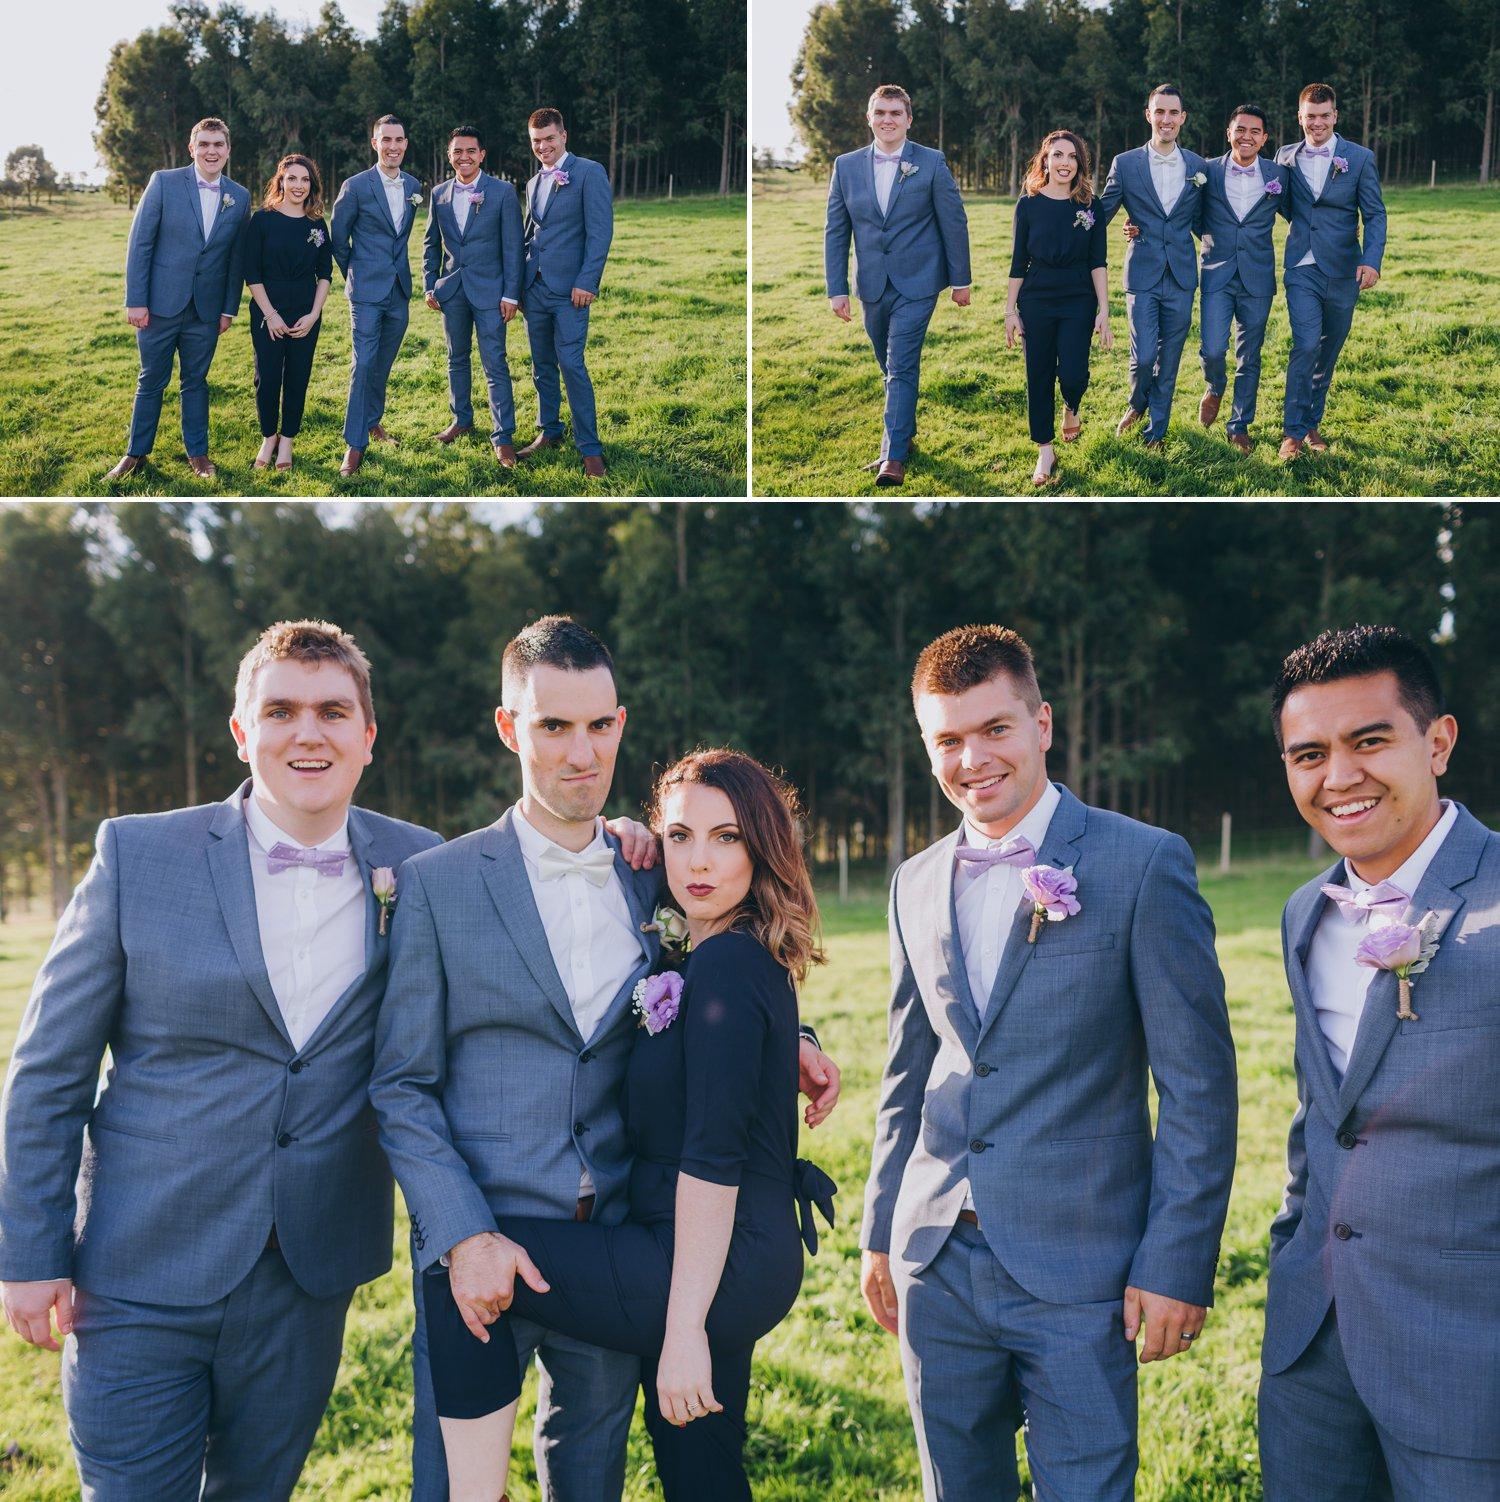 Peregrines Wedding Photography 24.jpg